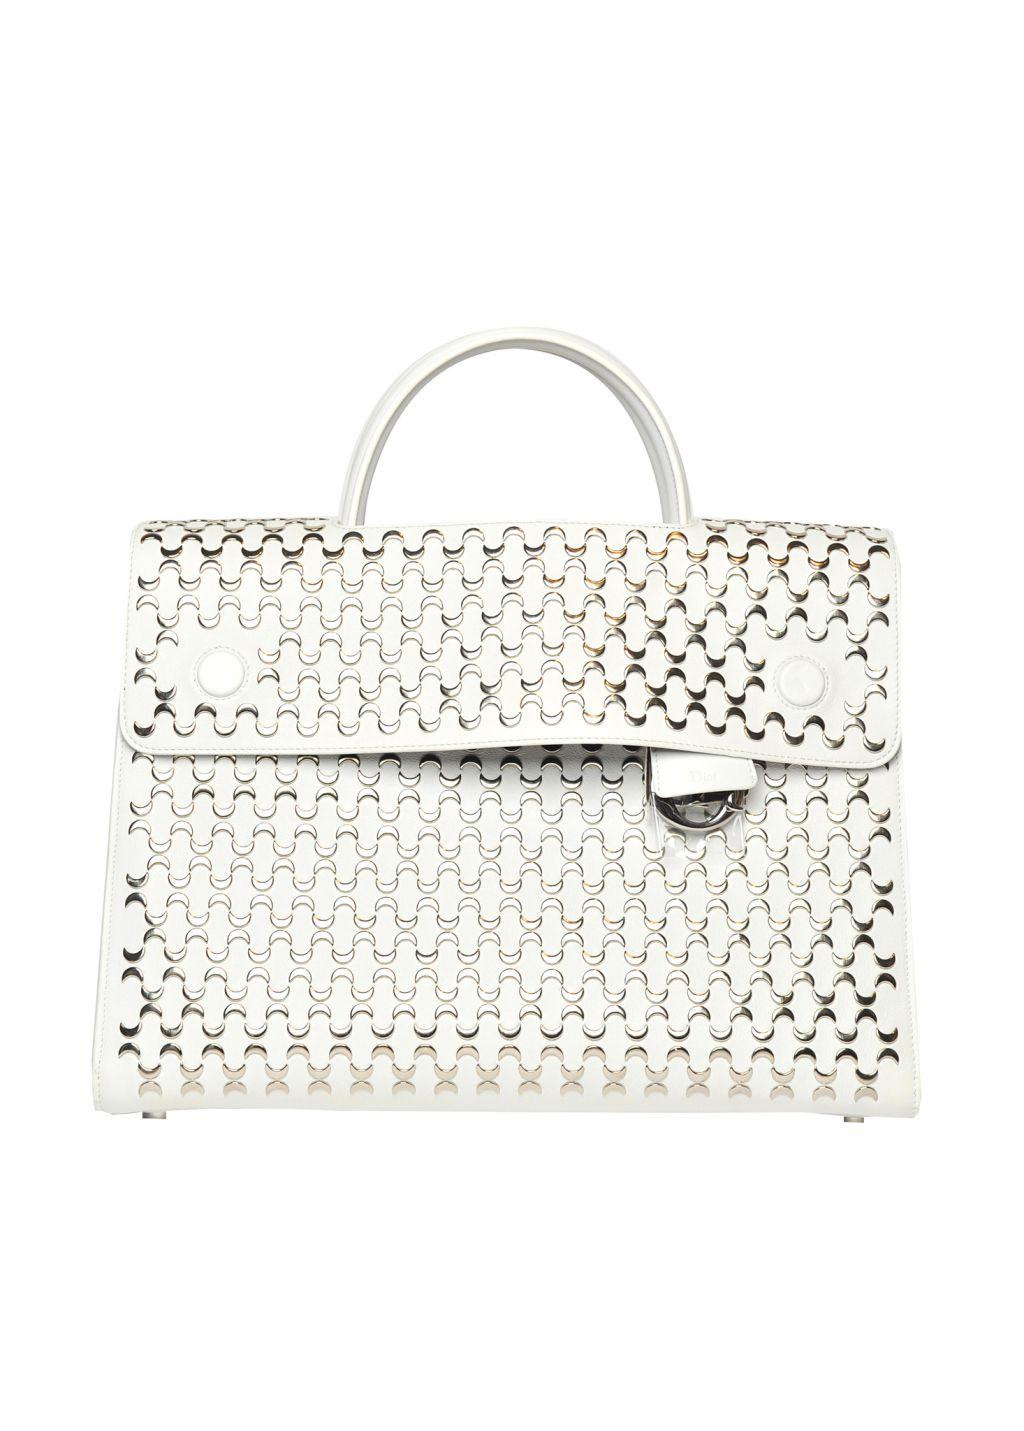 Dior Leather Bag.